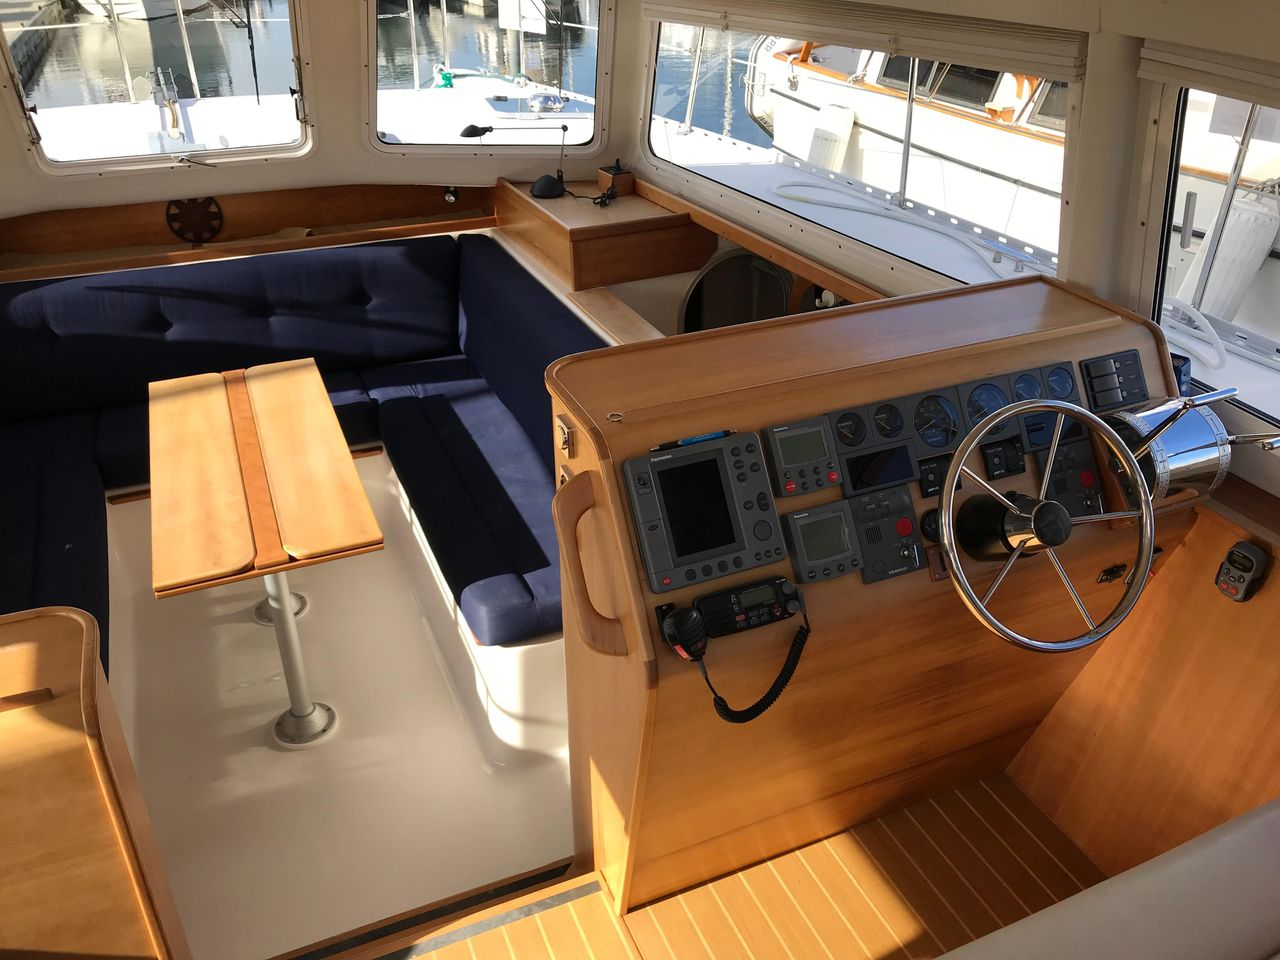 2003 Used Pdq MV34 Power Catamaran Power Catamaran Boat For